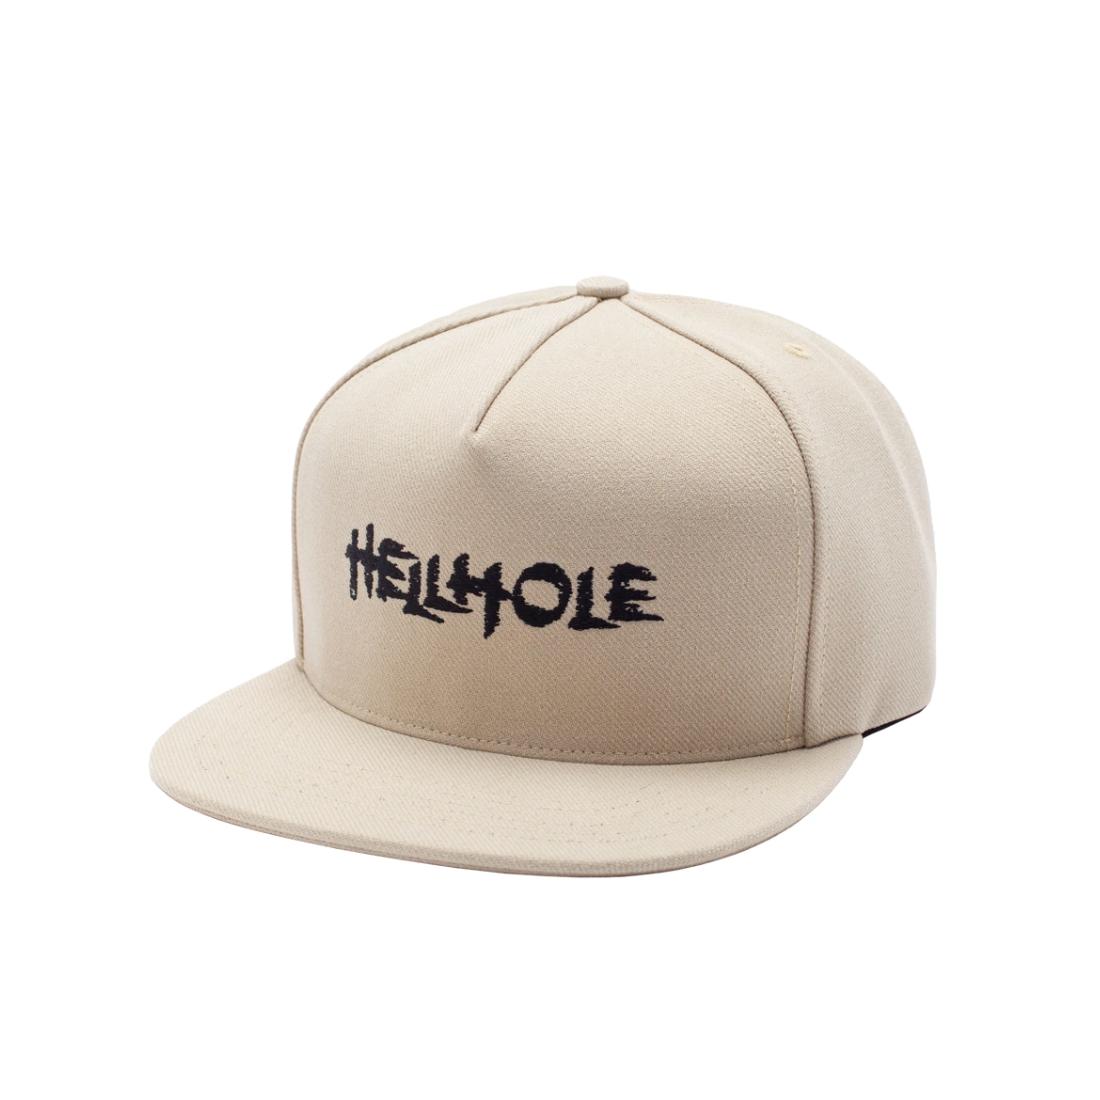 【Hockey】Hellhole 5Panel Cap - Tan